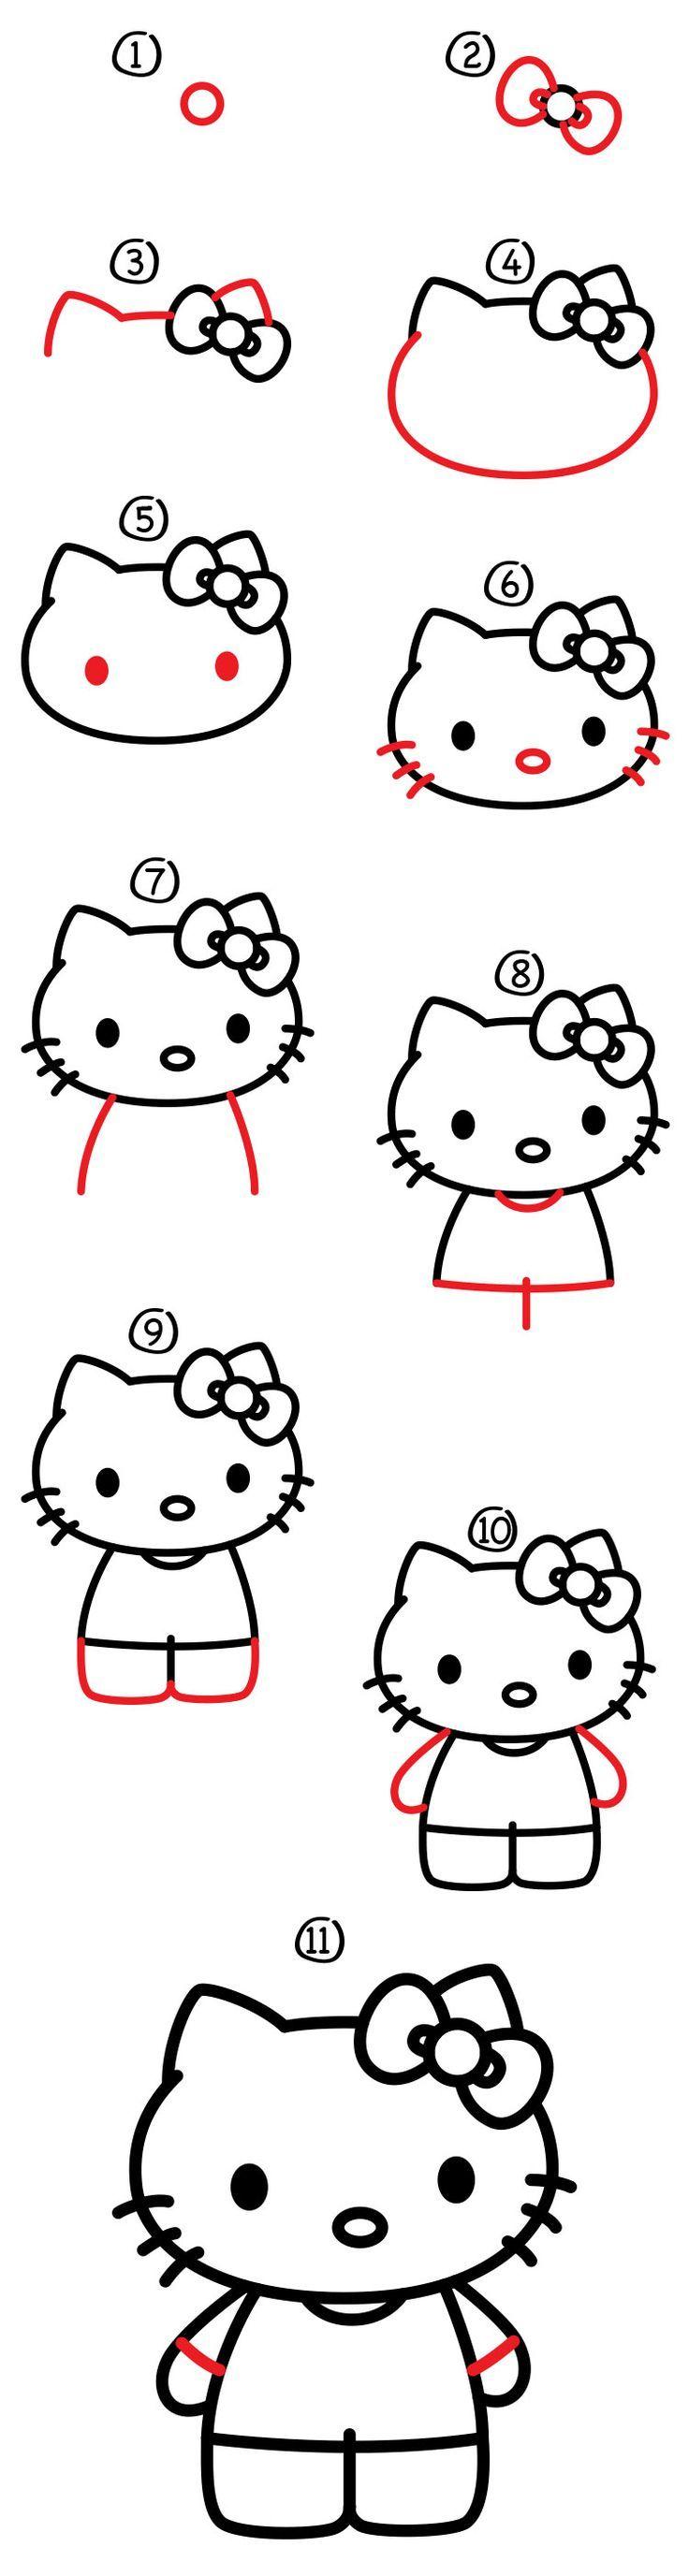 How to draw hello kitty art for kids hub hello kitty